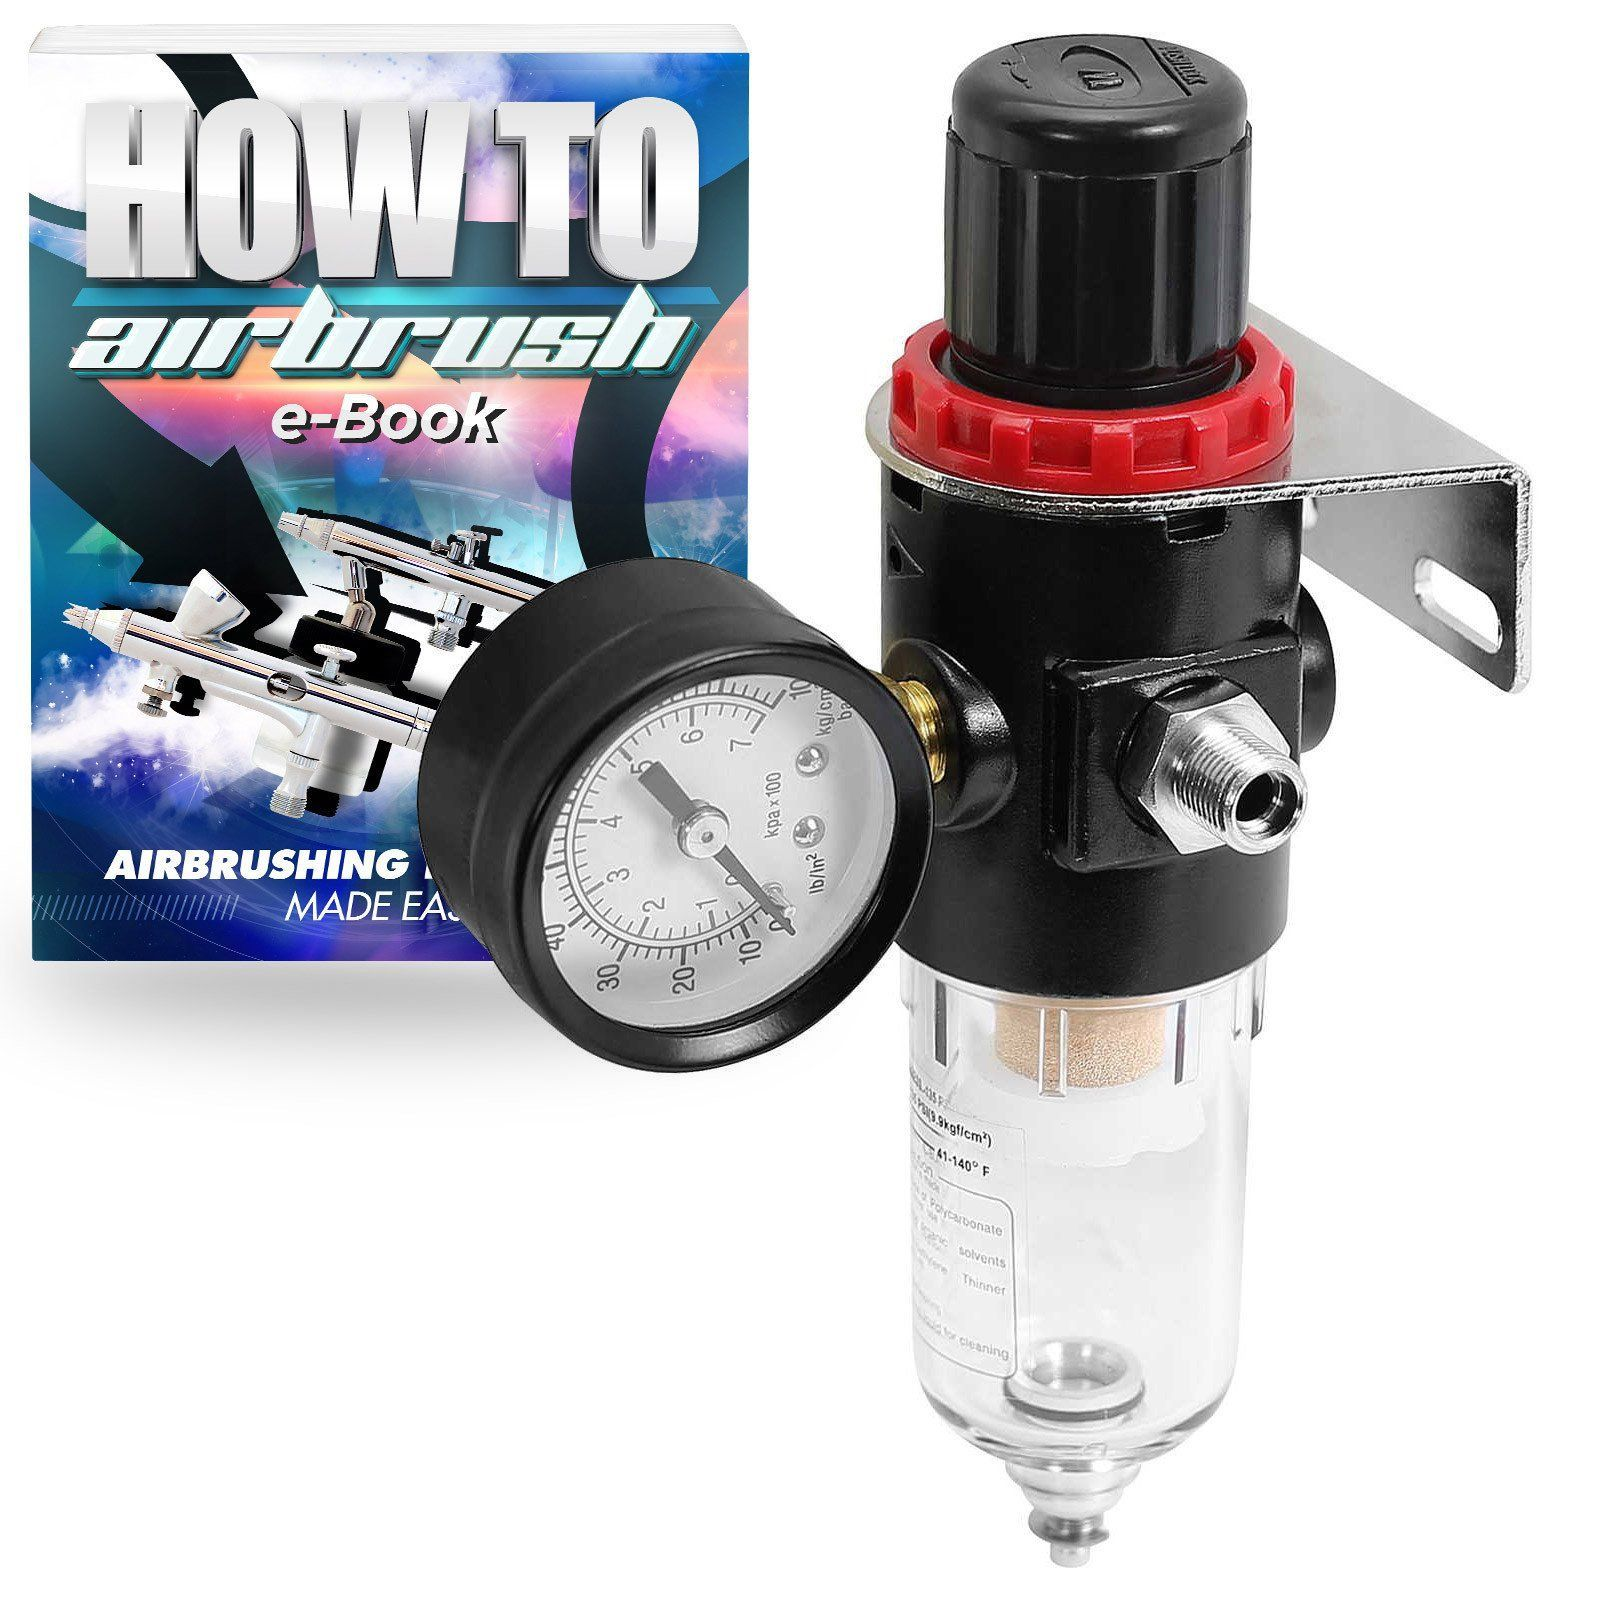 Airbrush Air Compressor Regulator with Pressure Gauge